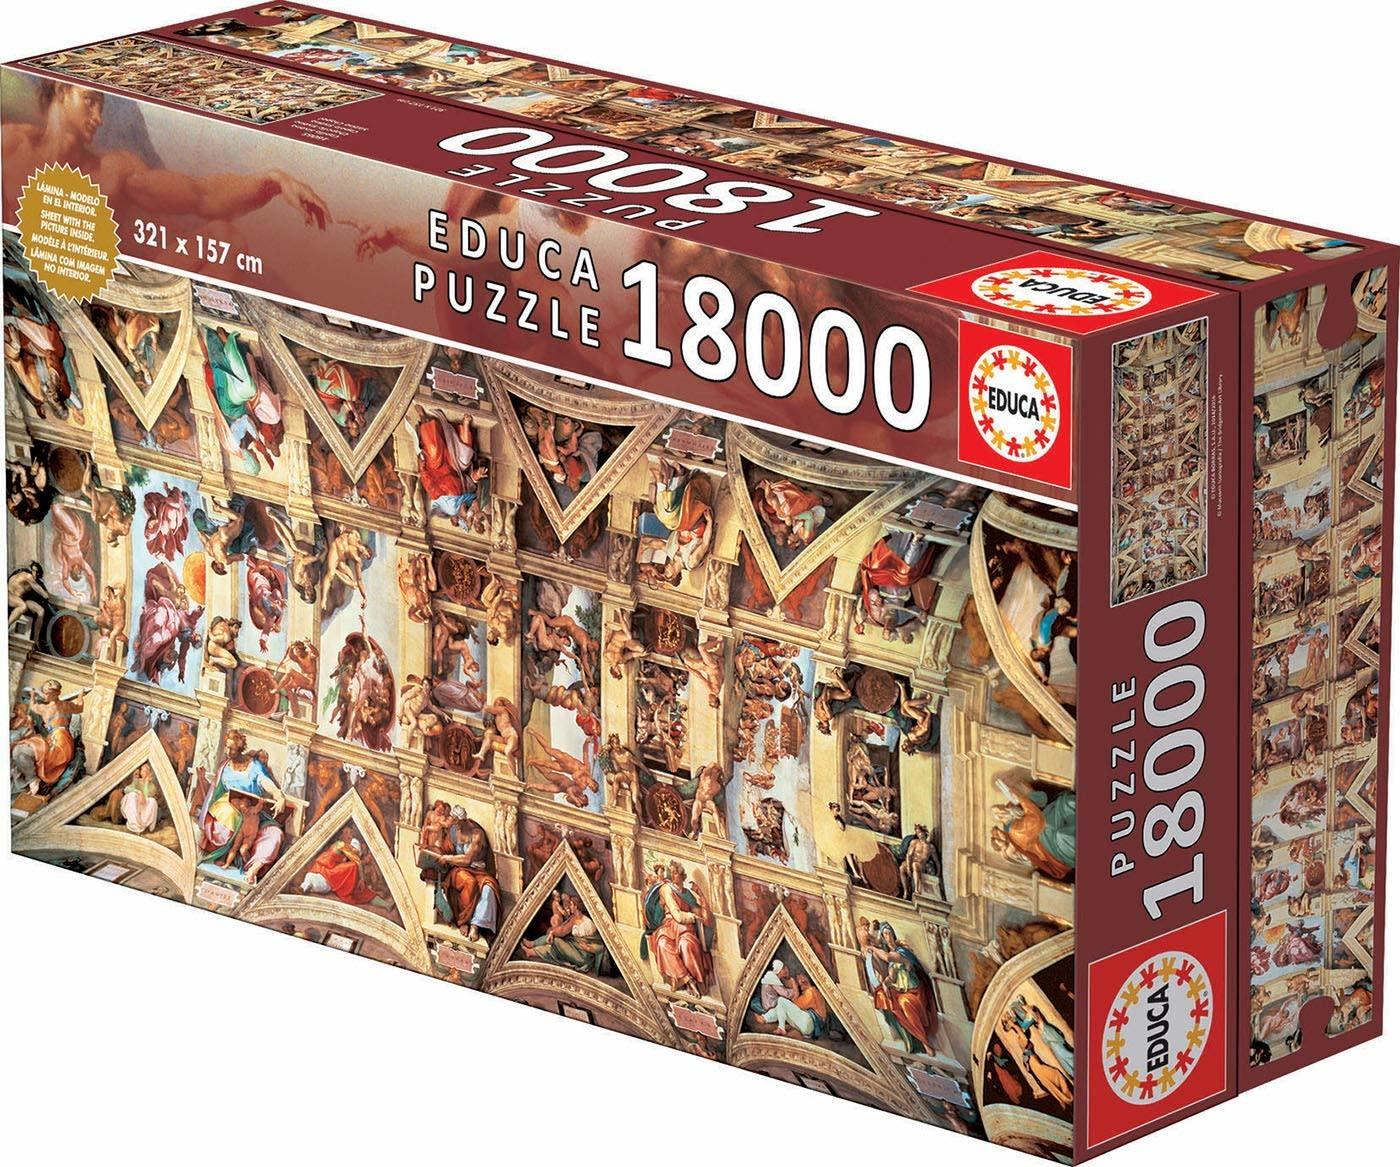 JOHN HANSEN COMPANY ED18000 SISTINE CHAPEL